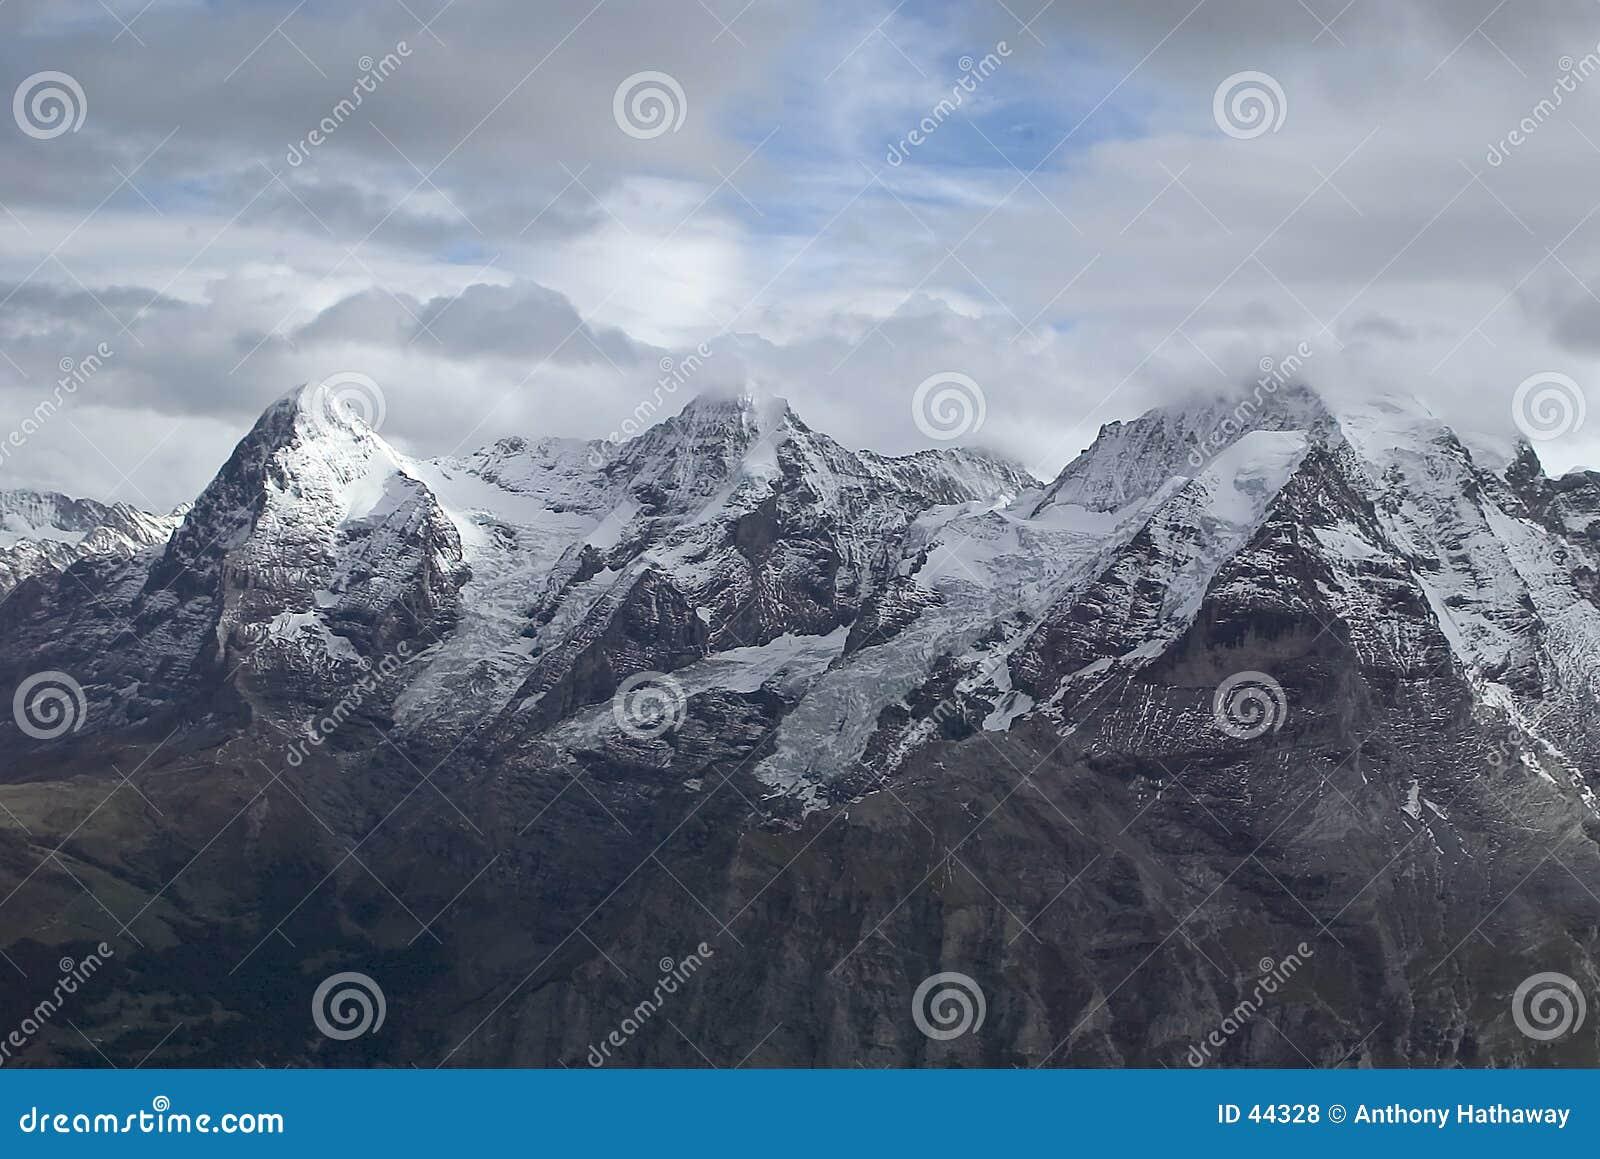 Góry wysokogórskie